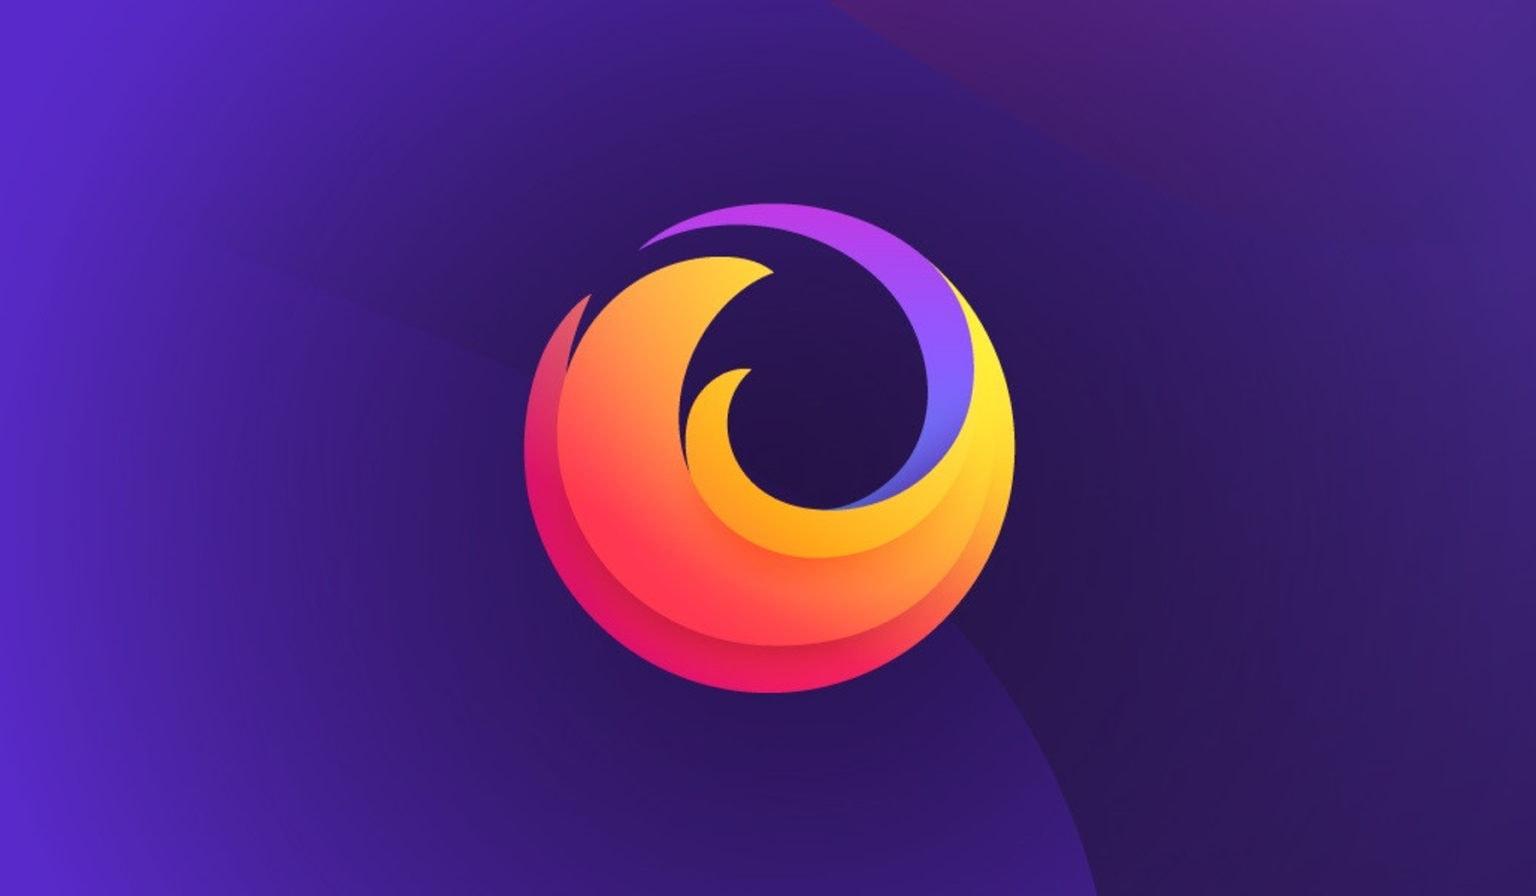 mozilla.firefox.logo.jpg